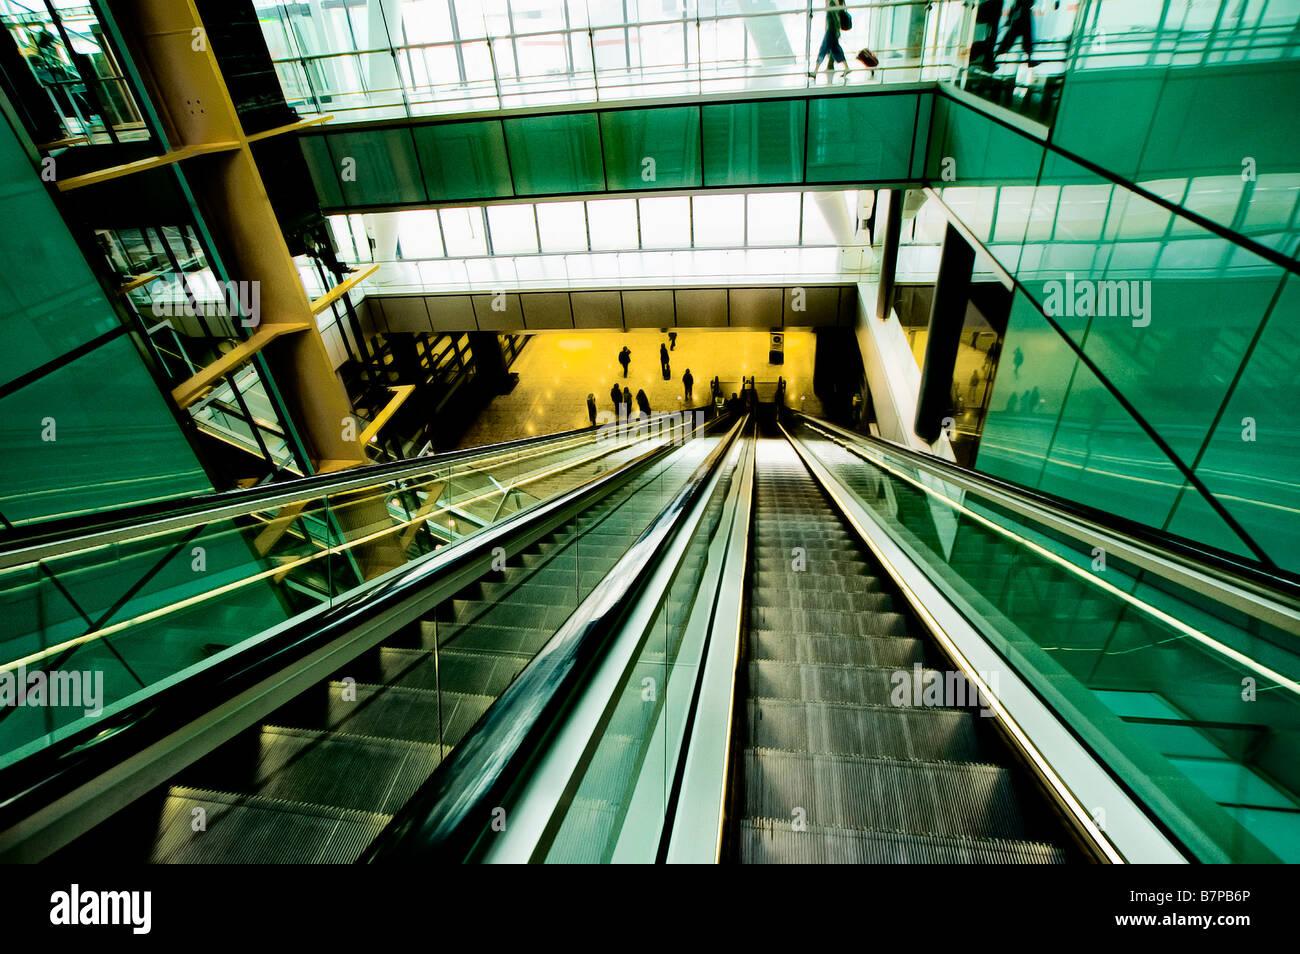 Escalators in the new Terminal 5 at Heathrow. - Stock Image